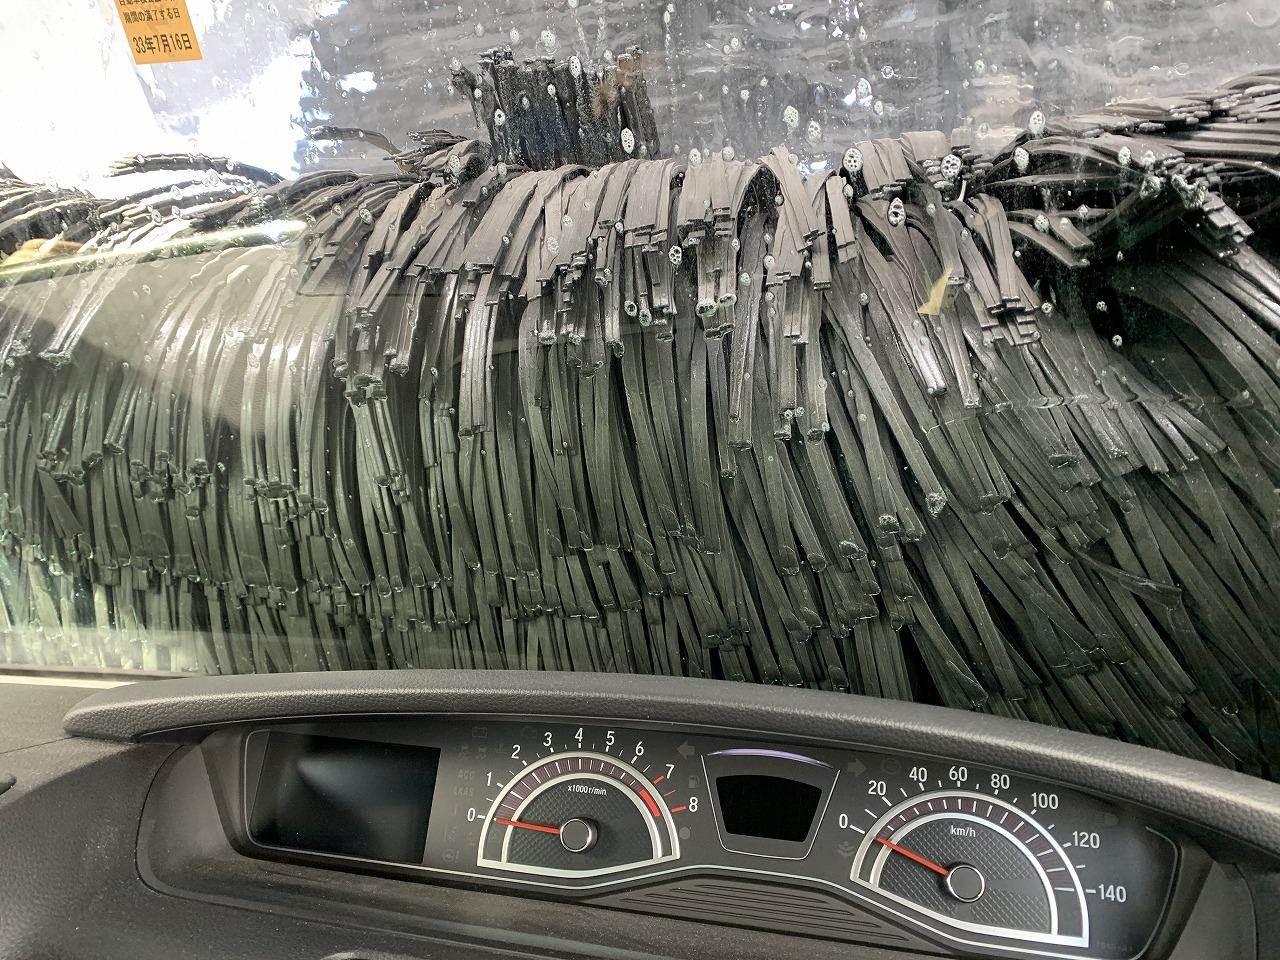 N-BOXカスタム新年初洗車!雪道の塩カルを落とすために下回り洗車しました^^